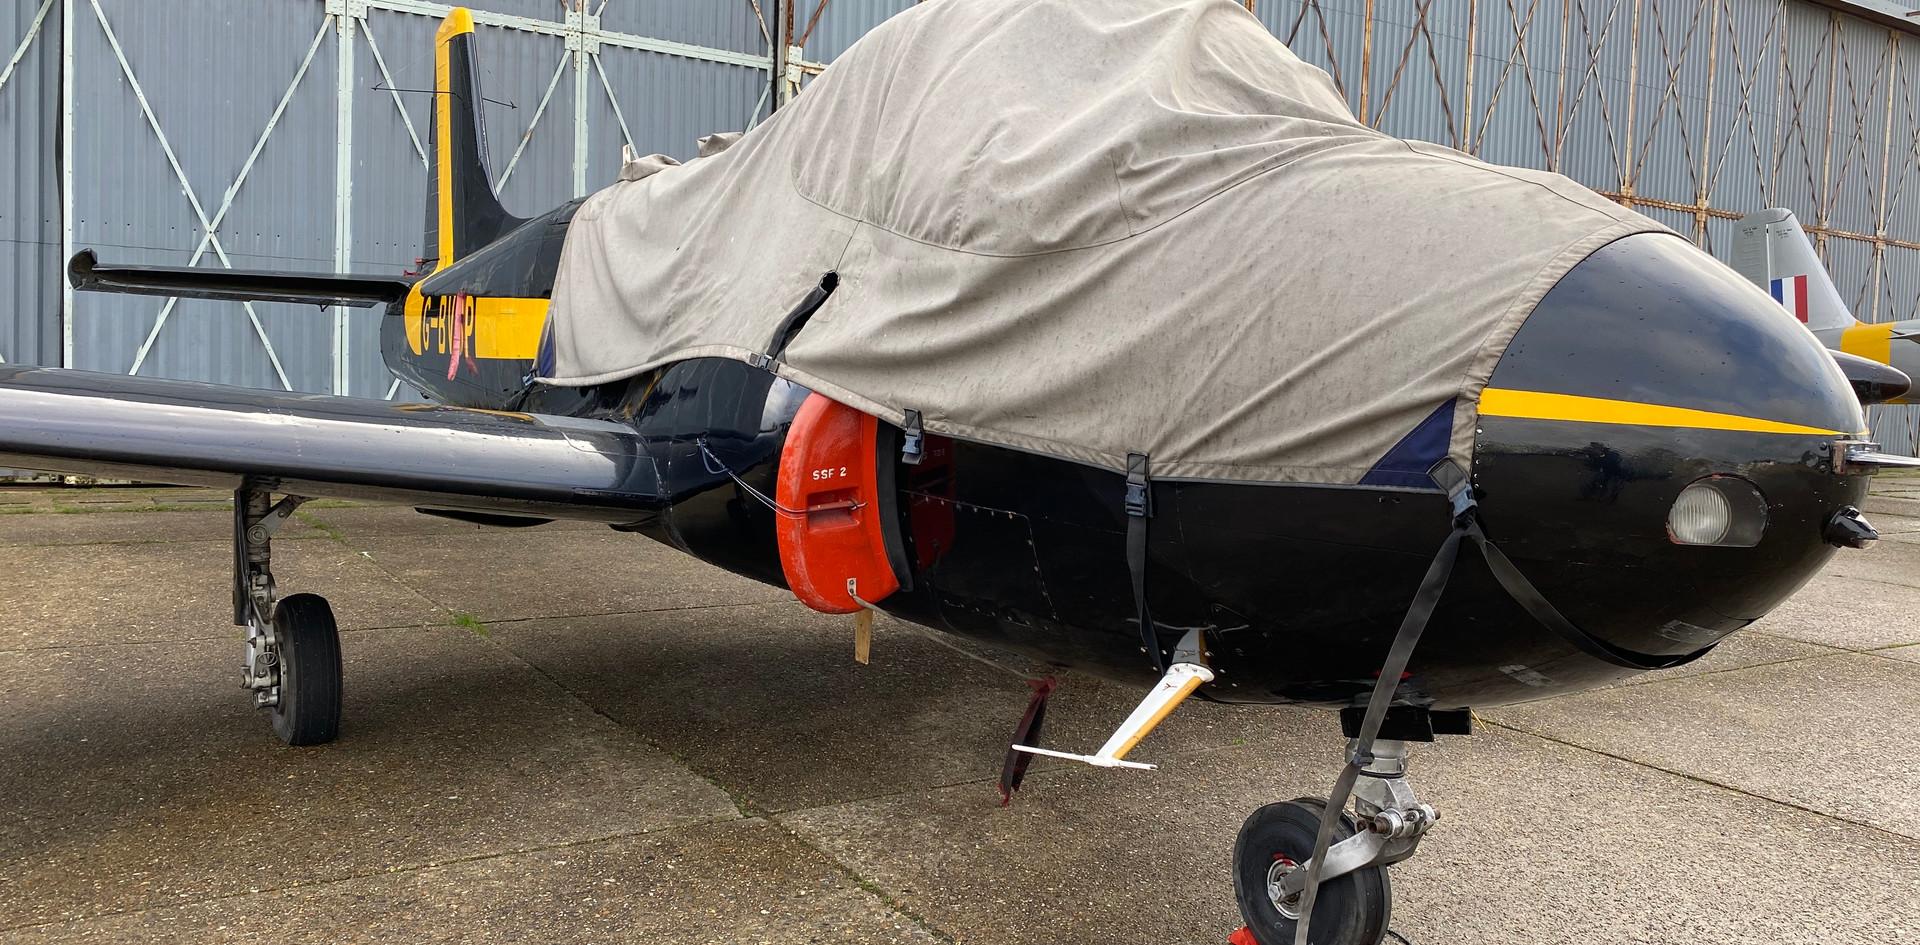 Jet Provost G-BVSP November 2019 Front V